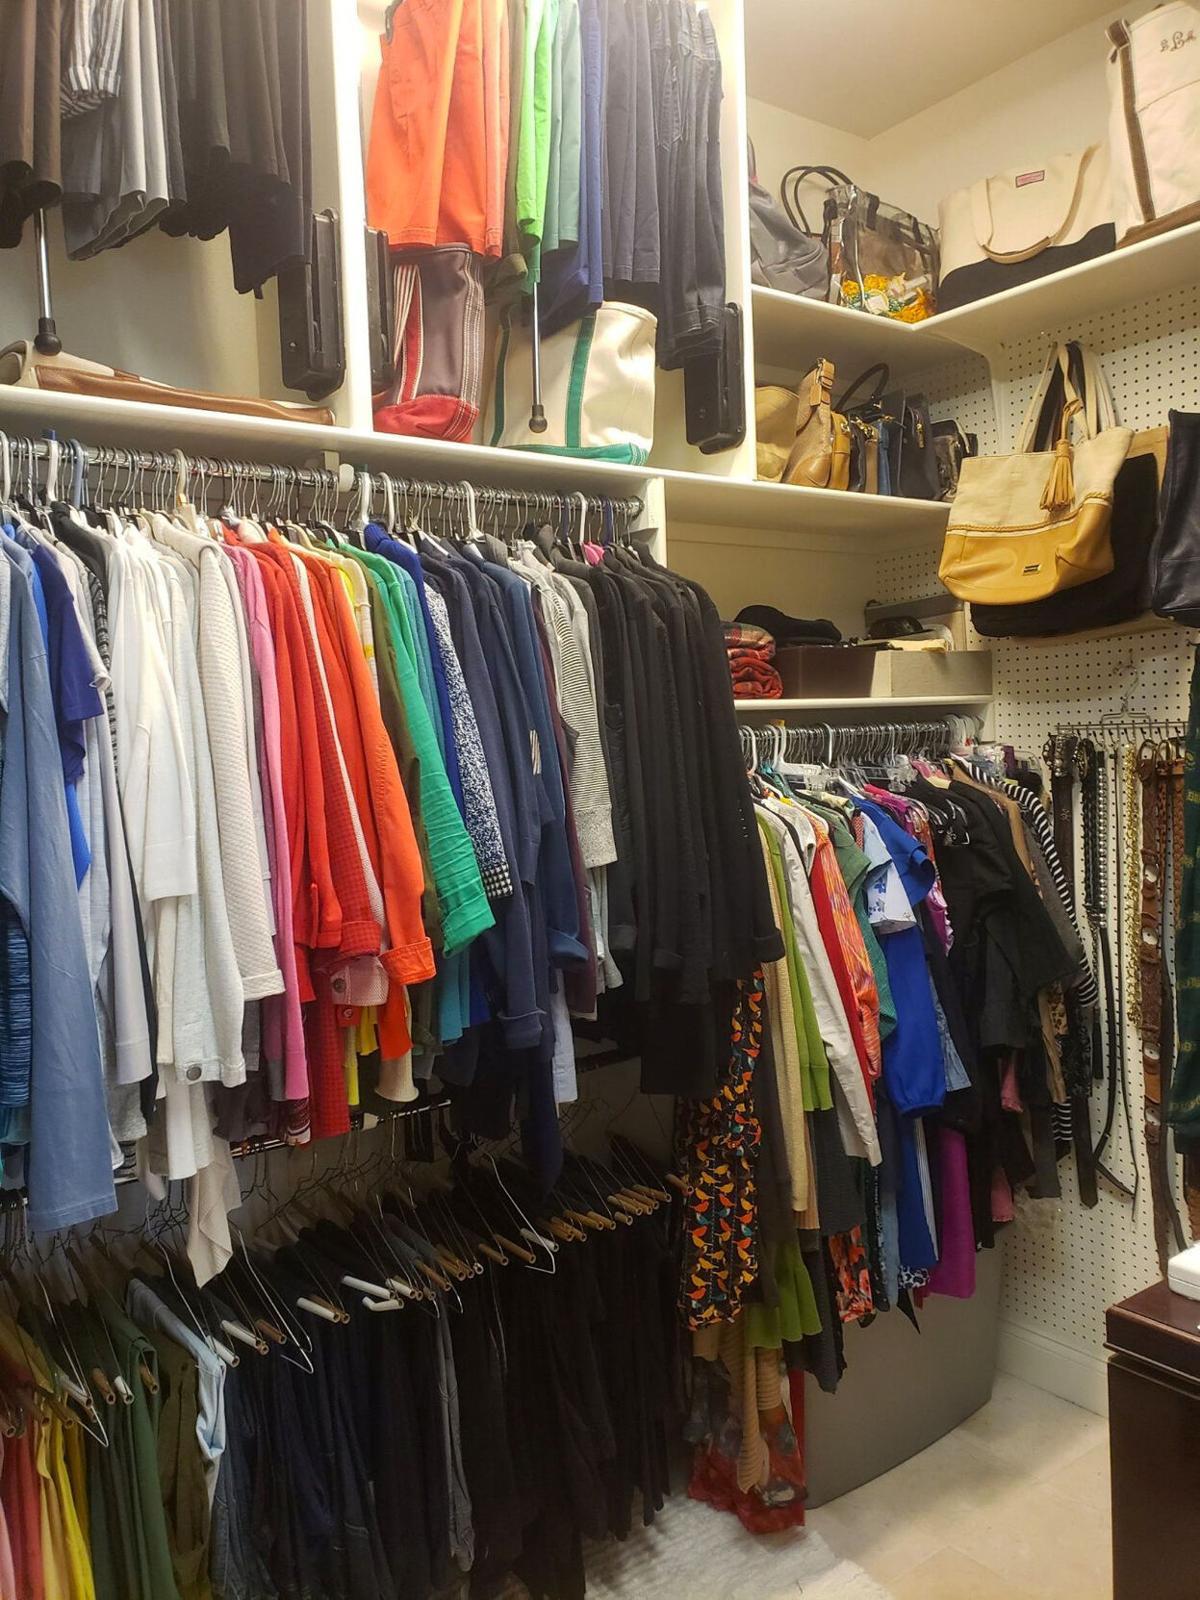 nporganized.jpg